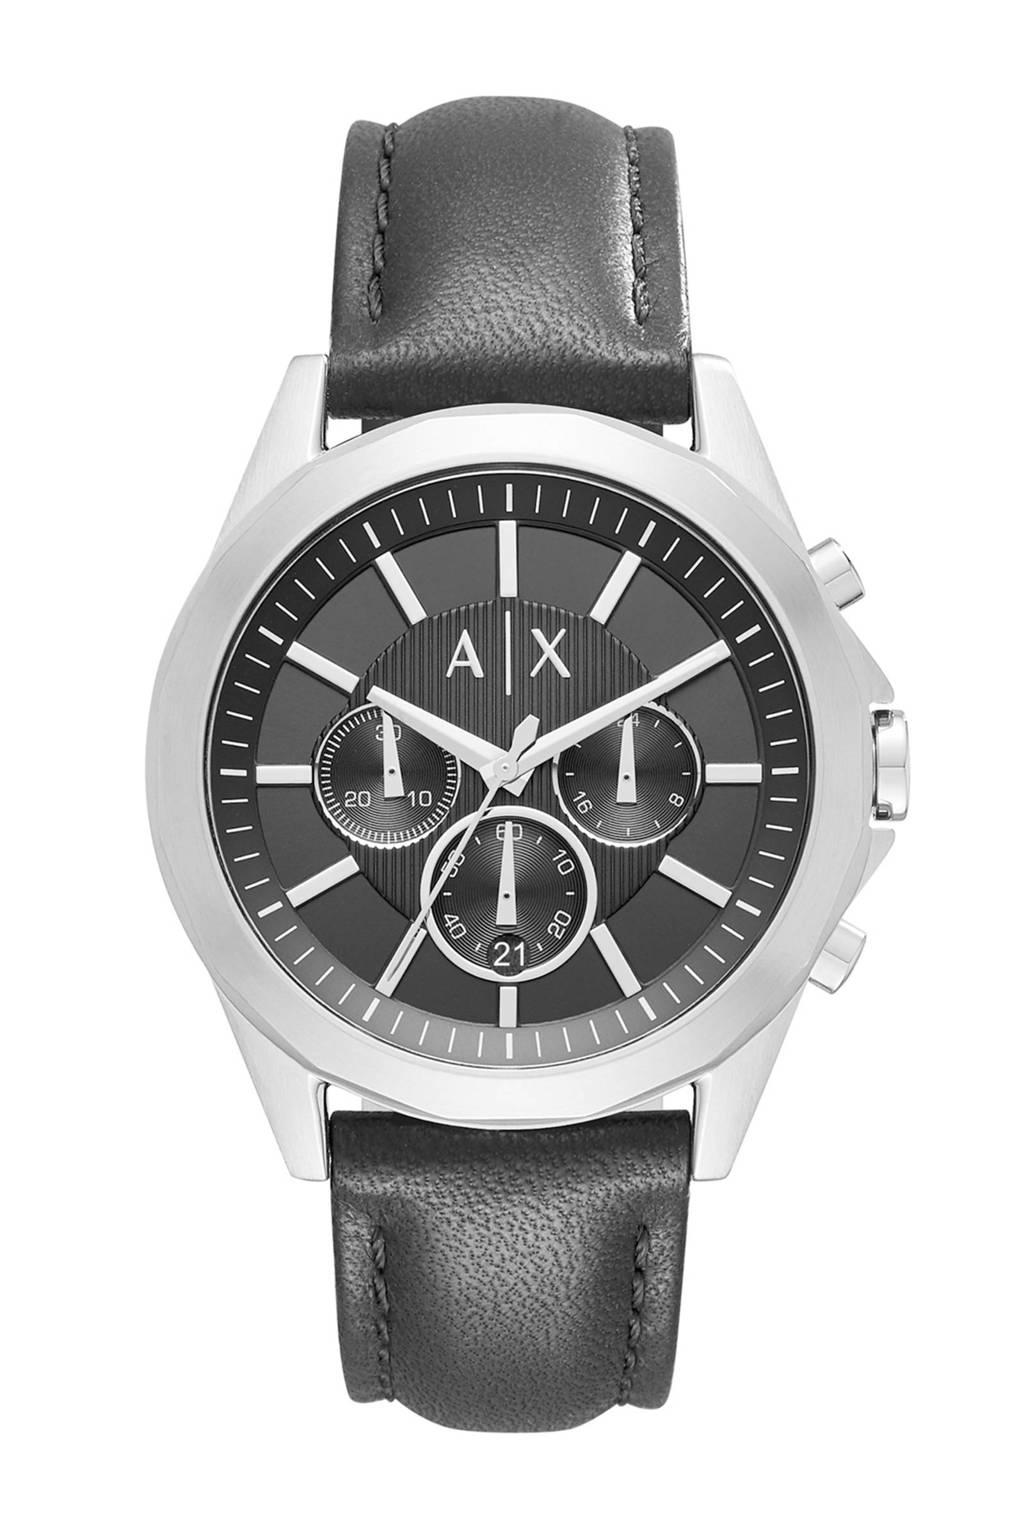 Armani Exchange chronograaf AX2604, Zwart/zilver